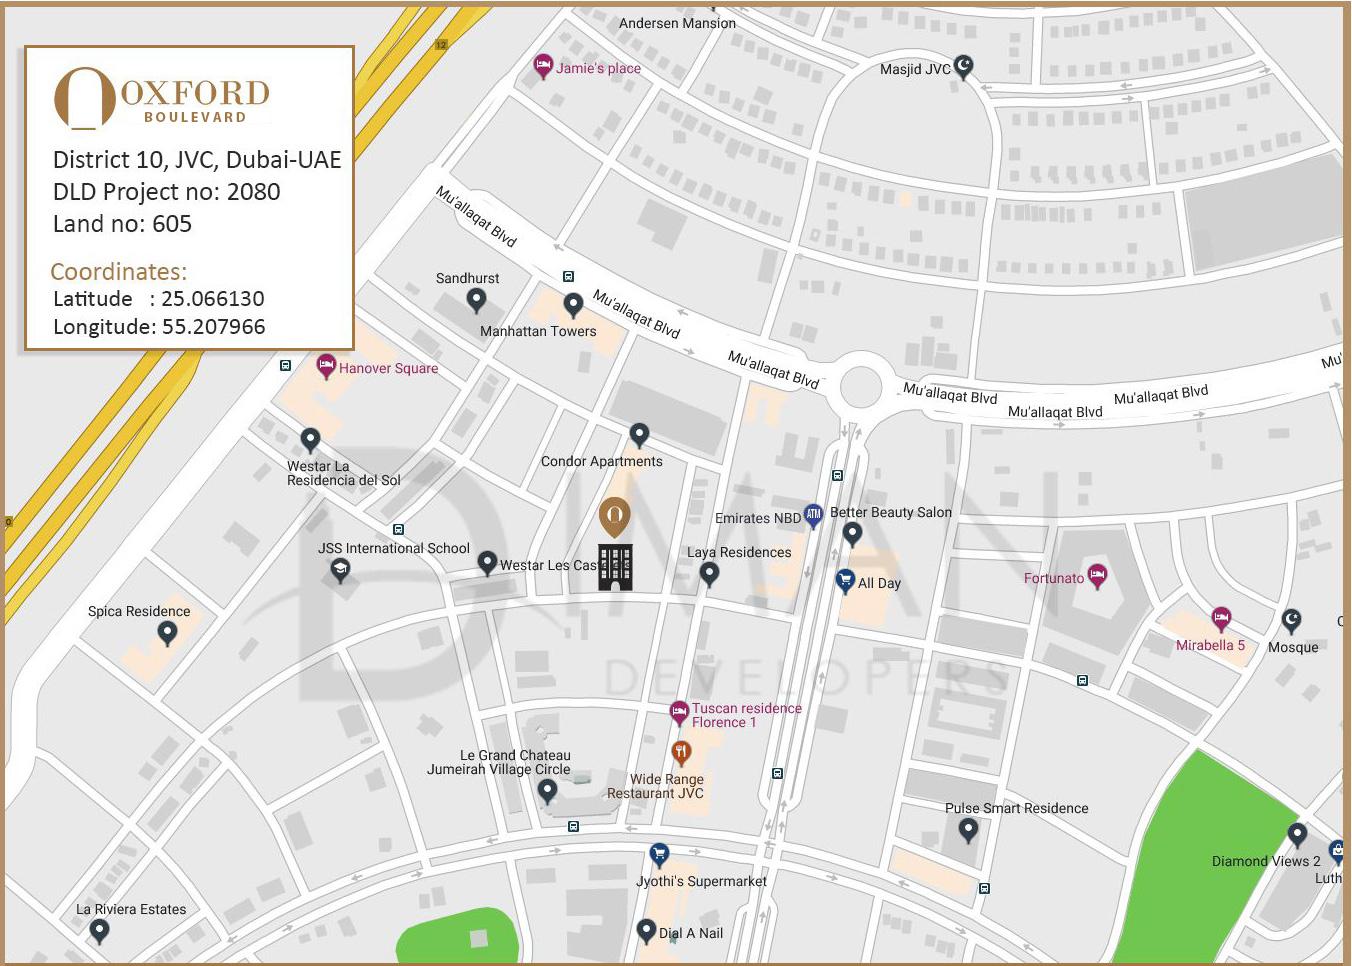 Oxford Boulevard -  Location Plan